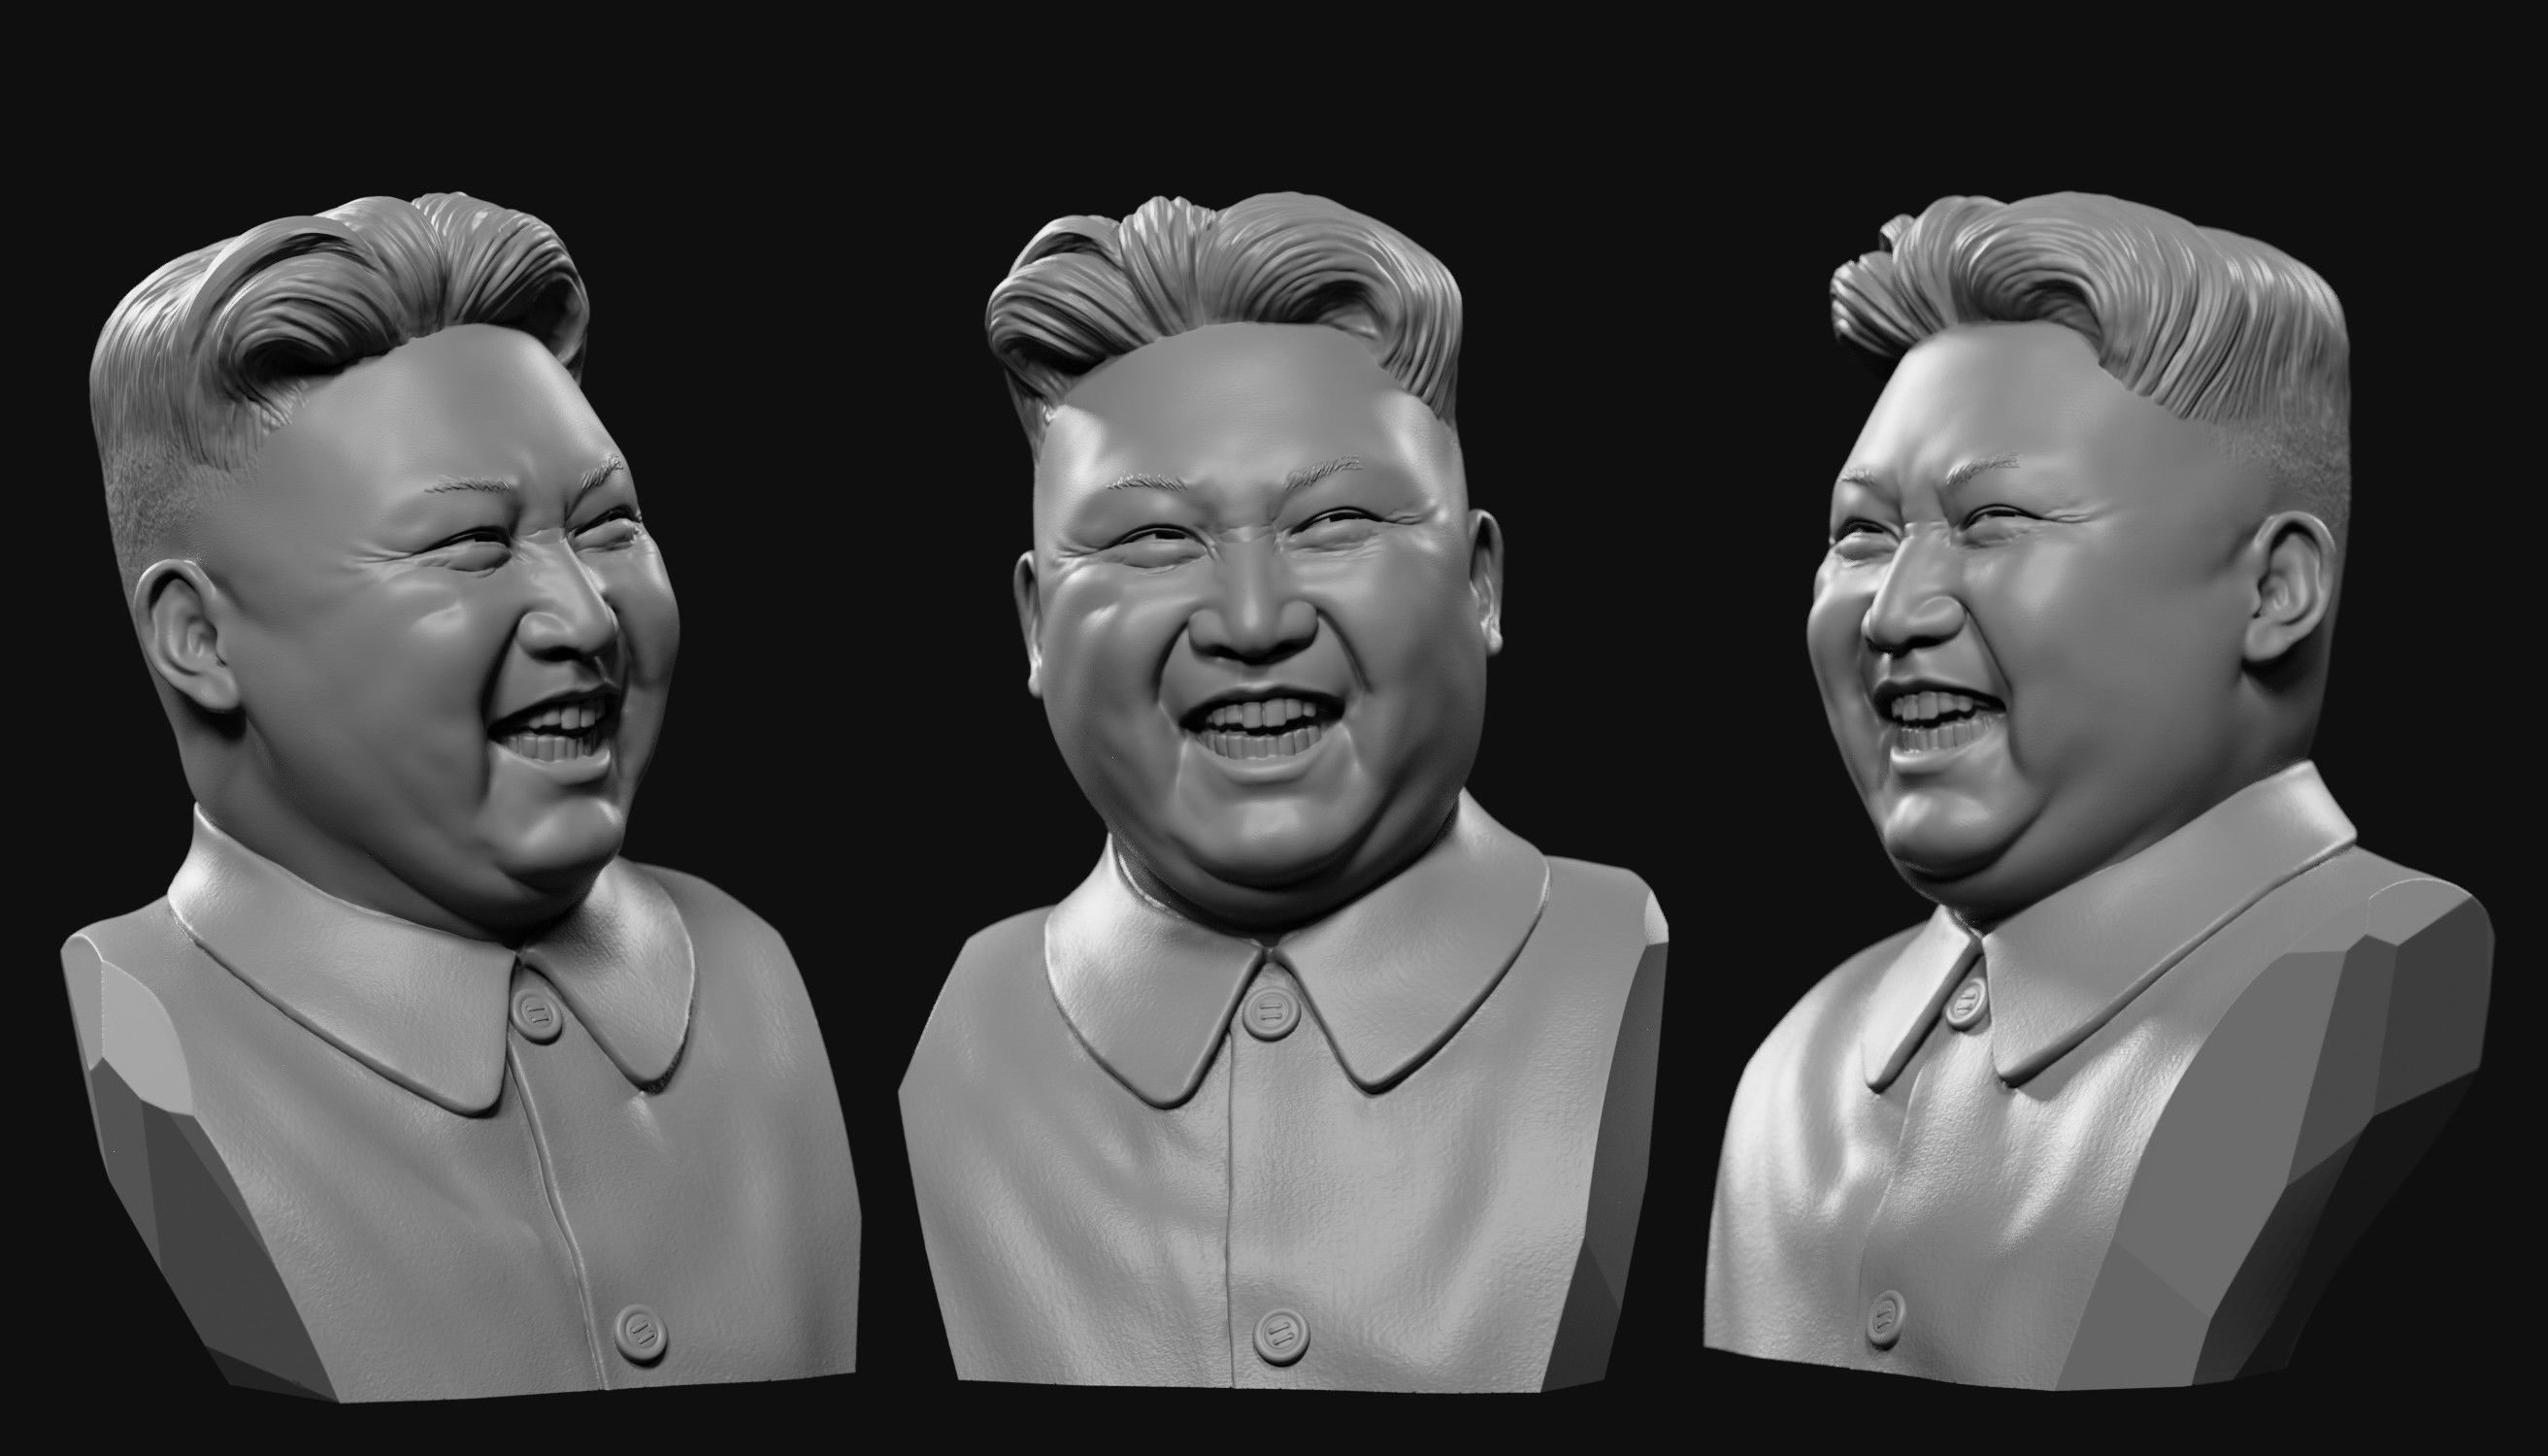 Kim Jong-UN 2 laughs